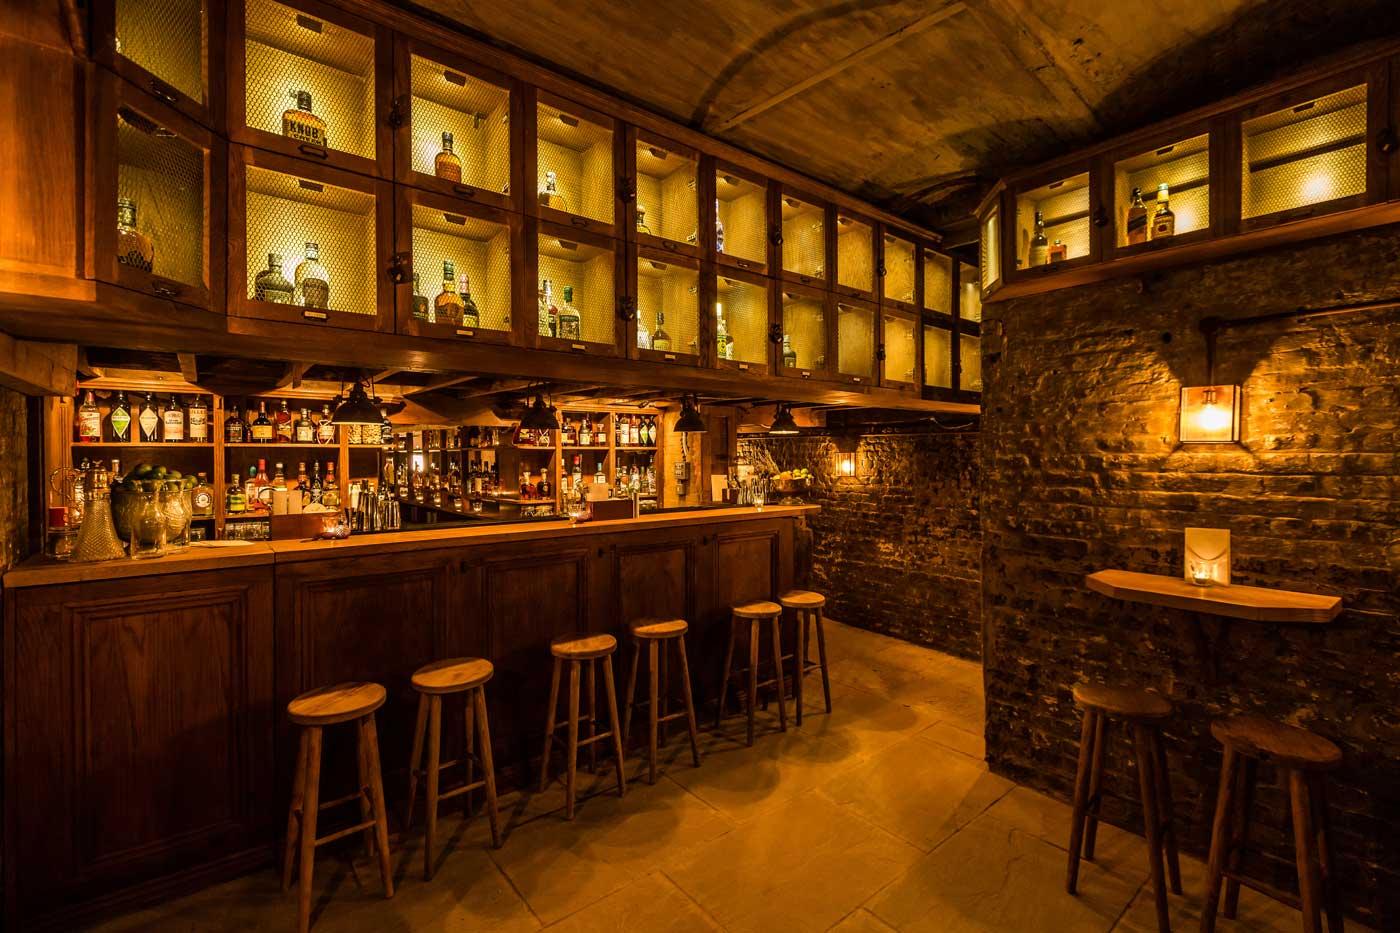 TT Liquor, Cellar Cocktail Bar, Shoreditch, east London, Cocktail Journeys